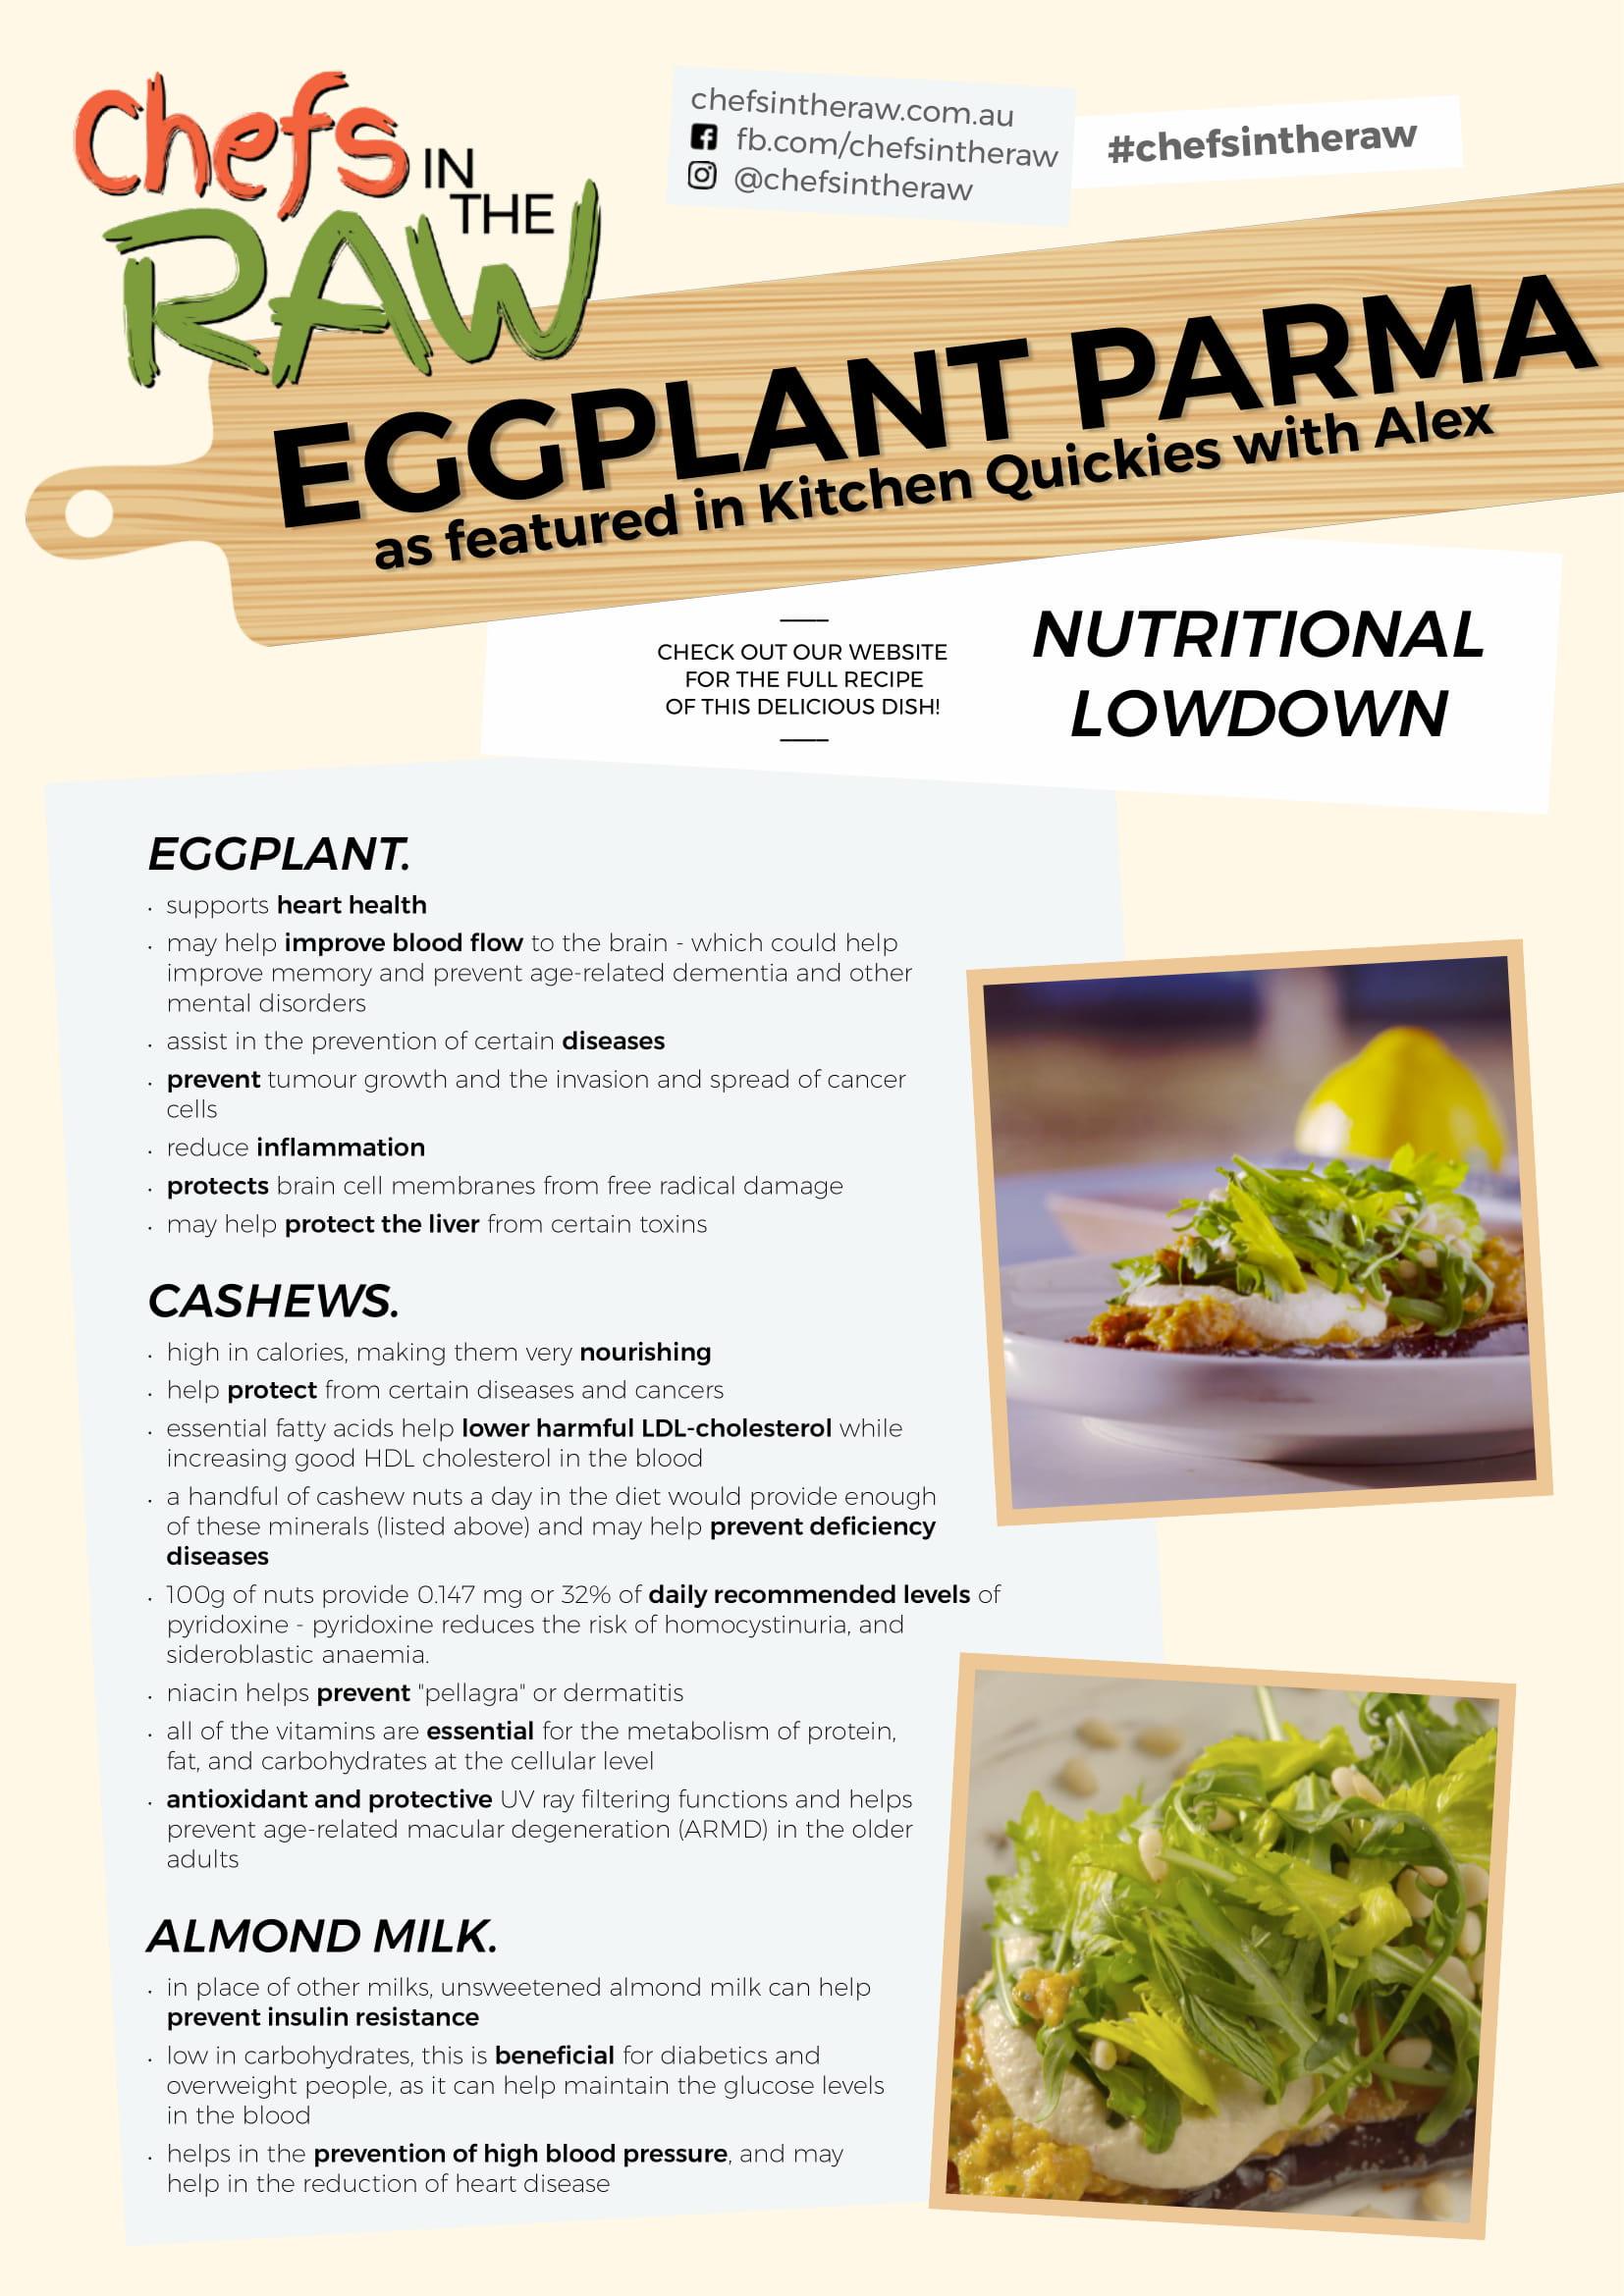 nutrition_eggplantParma-1.jpg